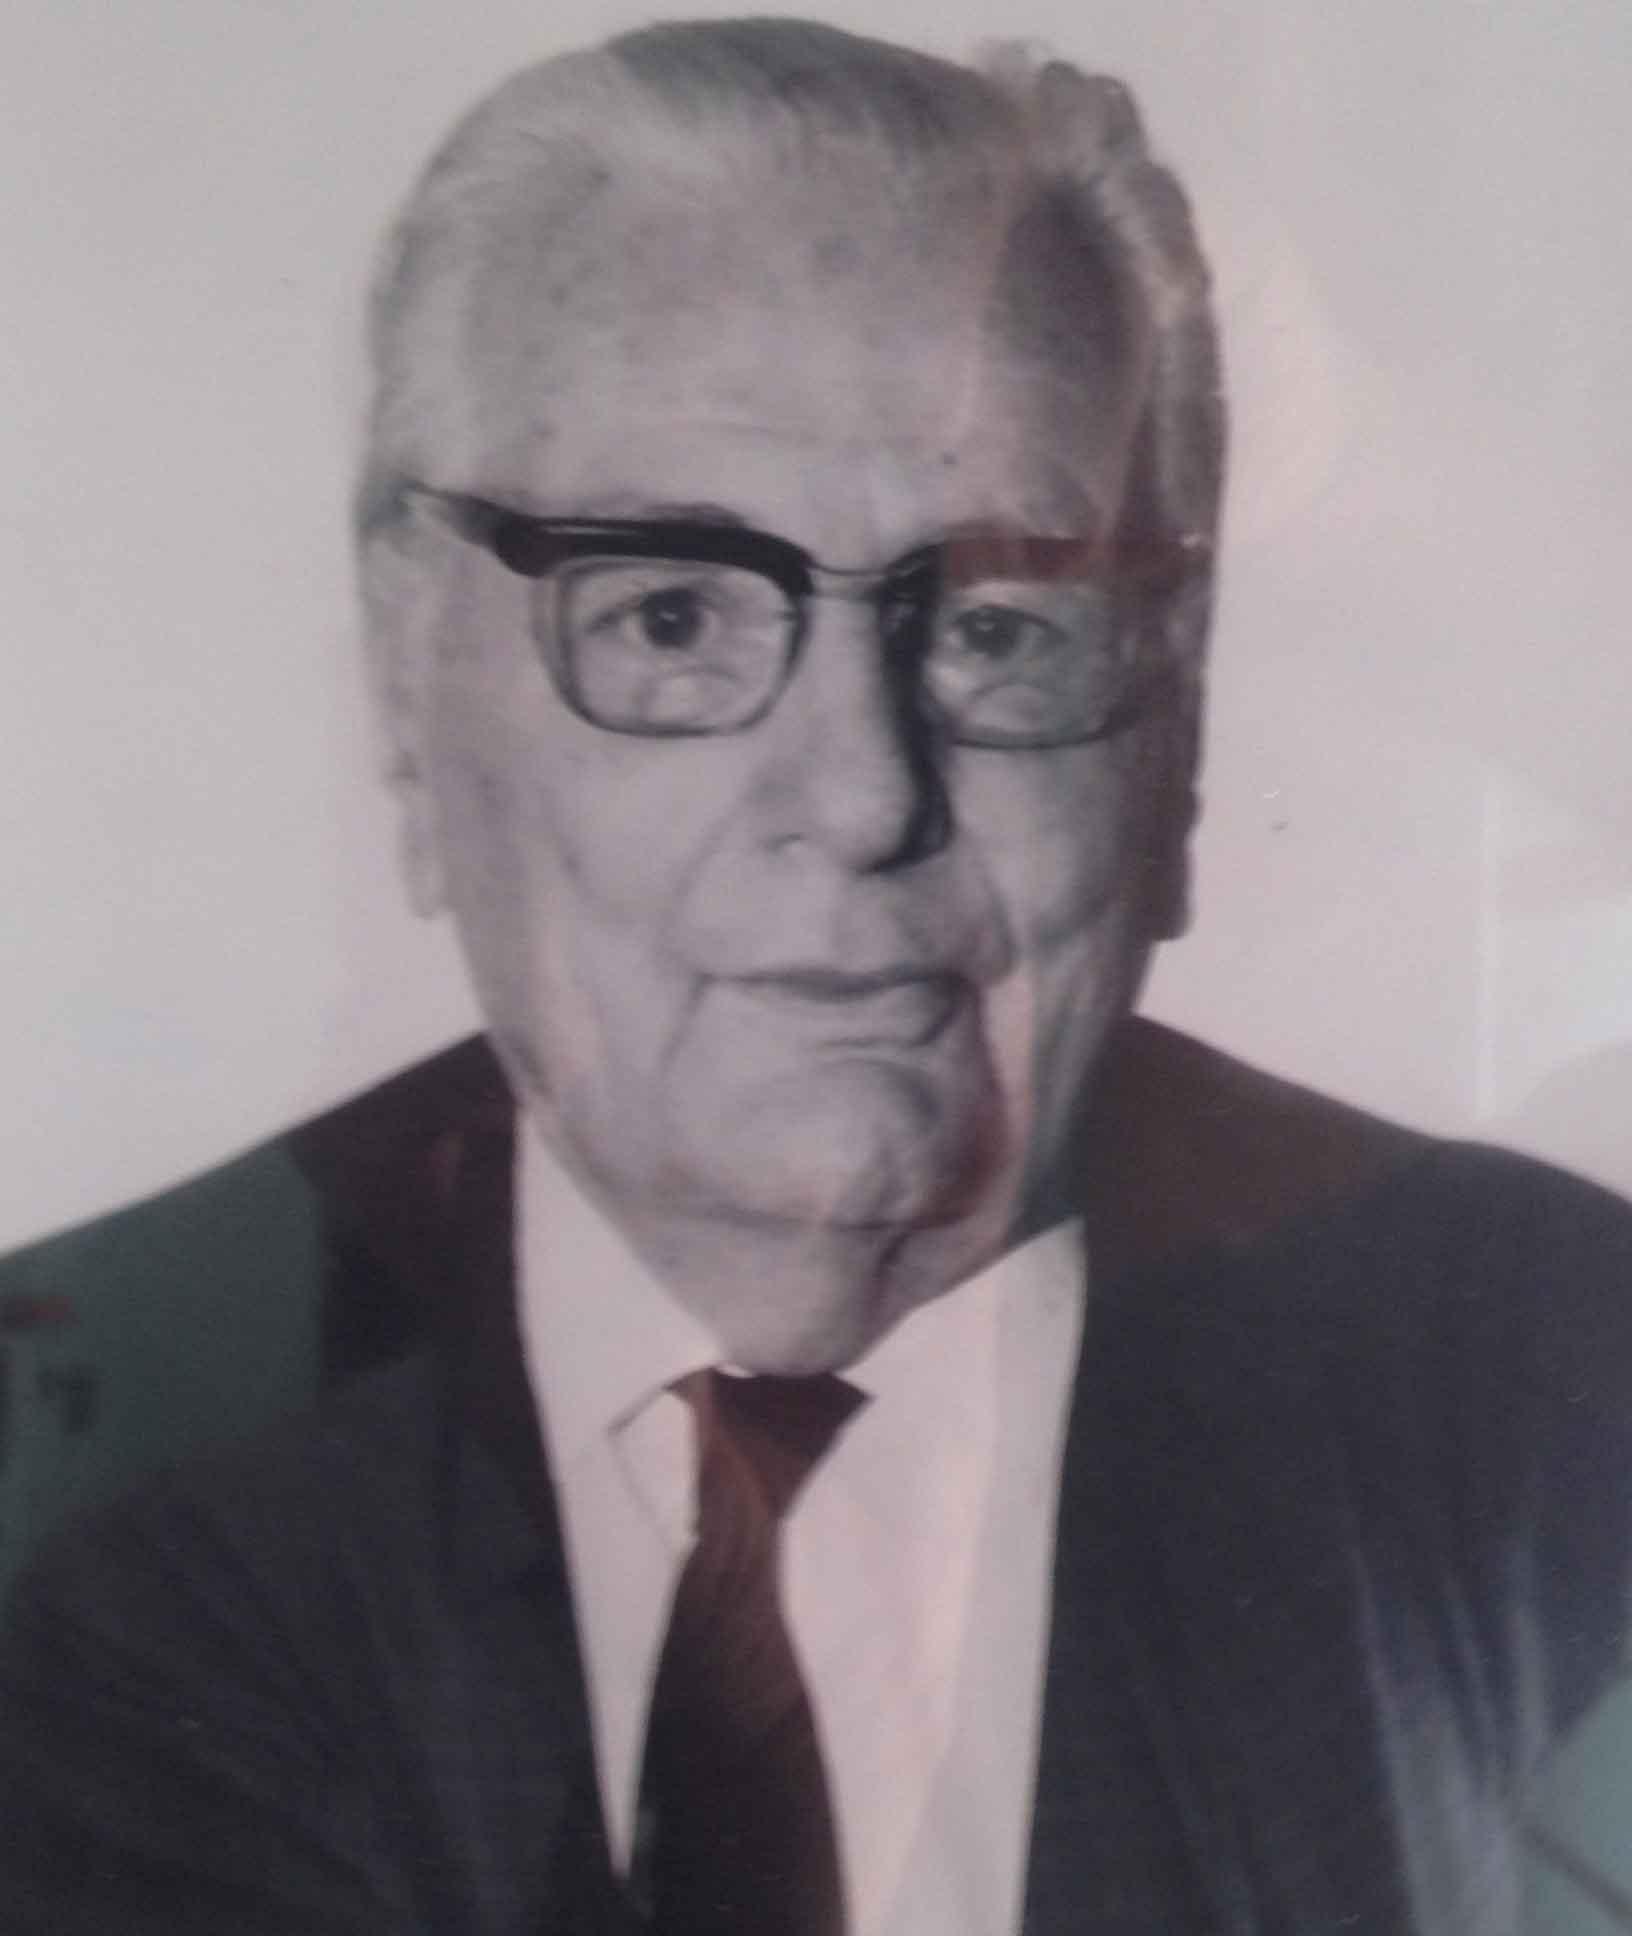 G.E. Papadopoulos